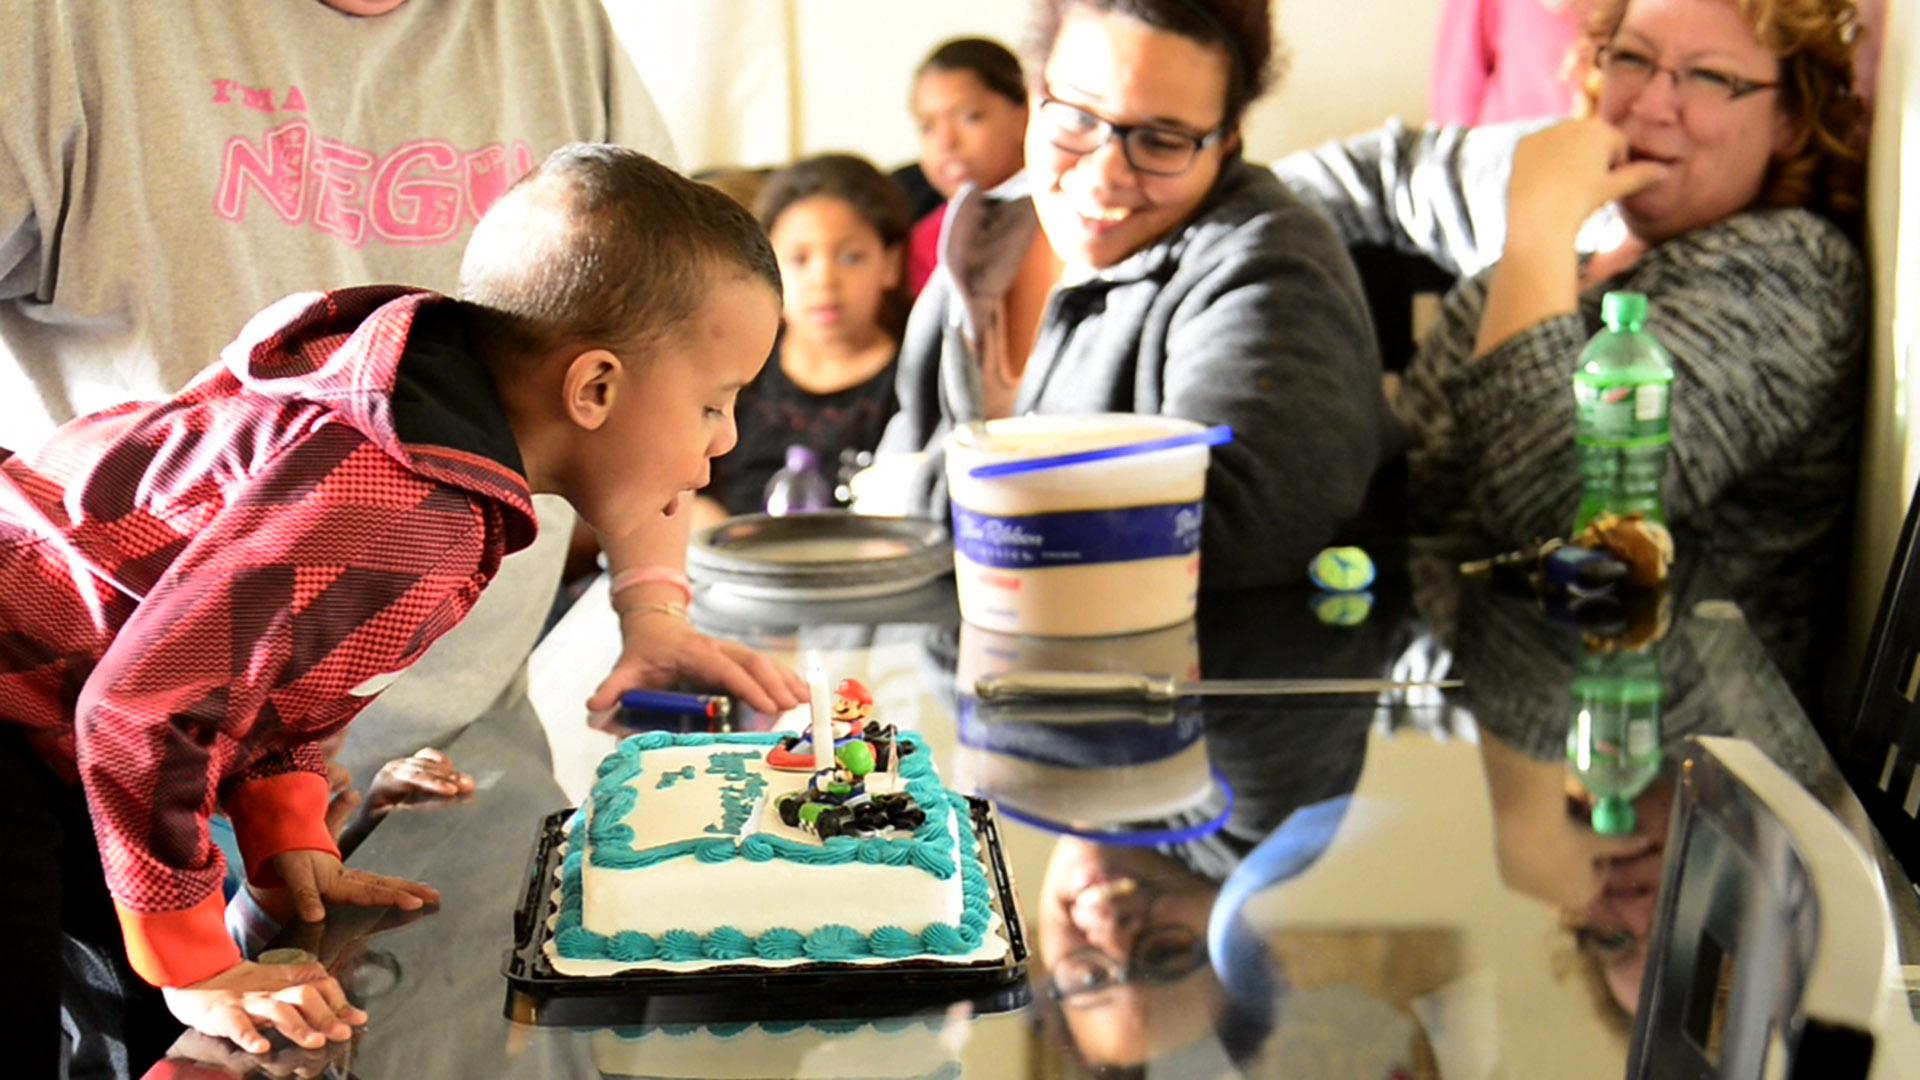 Tae's 5th birthday fighting brain cancer